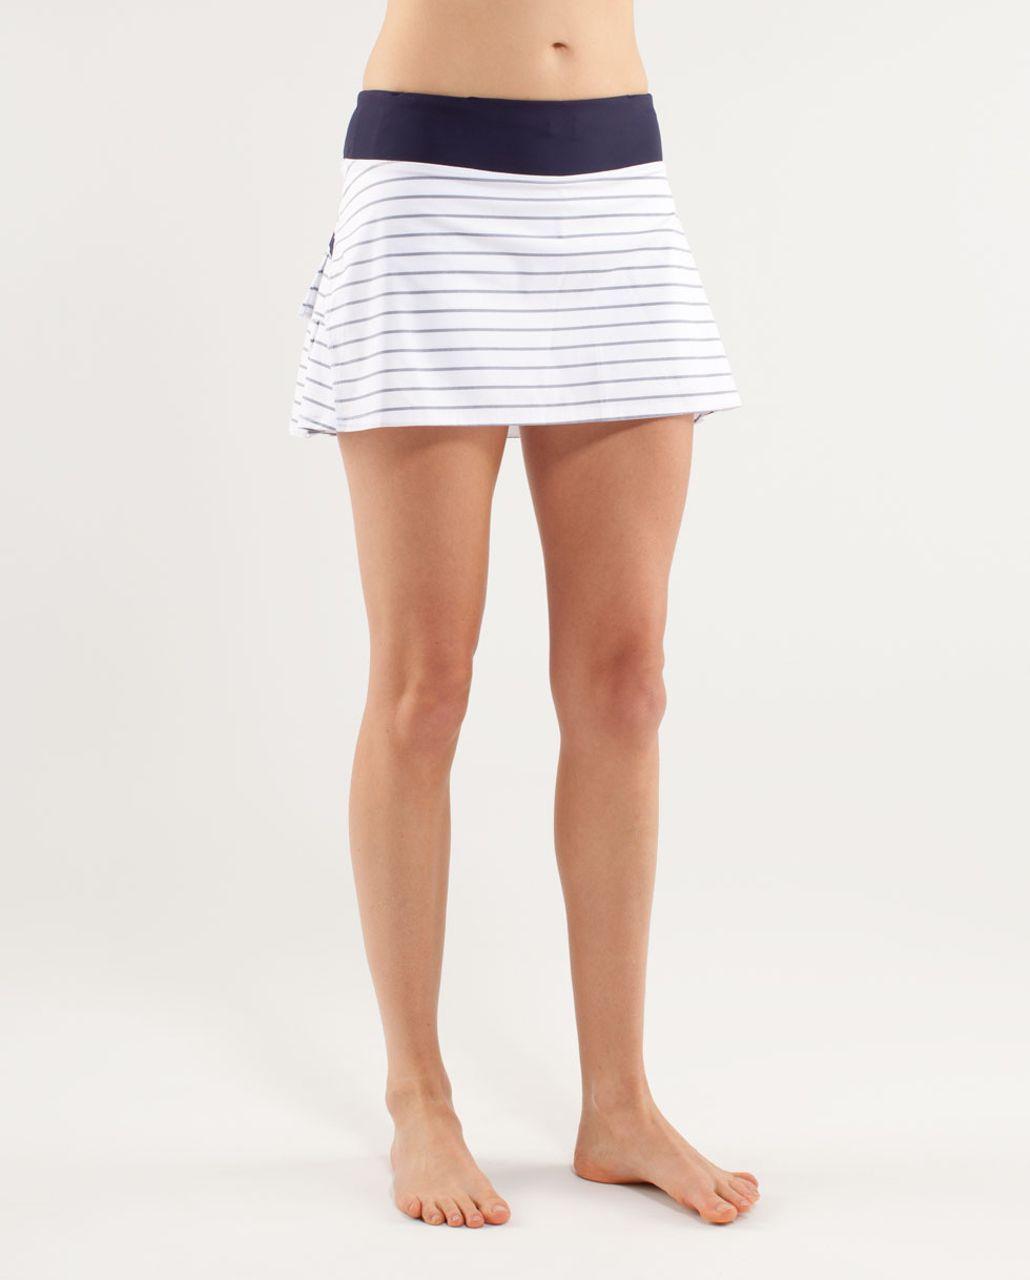 Lululemon Run:  Pace Setter Skirt - Quiet Stripe White Deep Indigo /  Deep Indigo